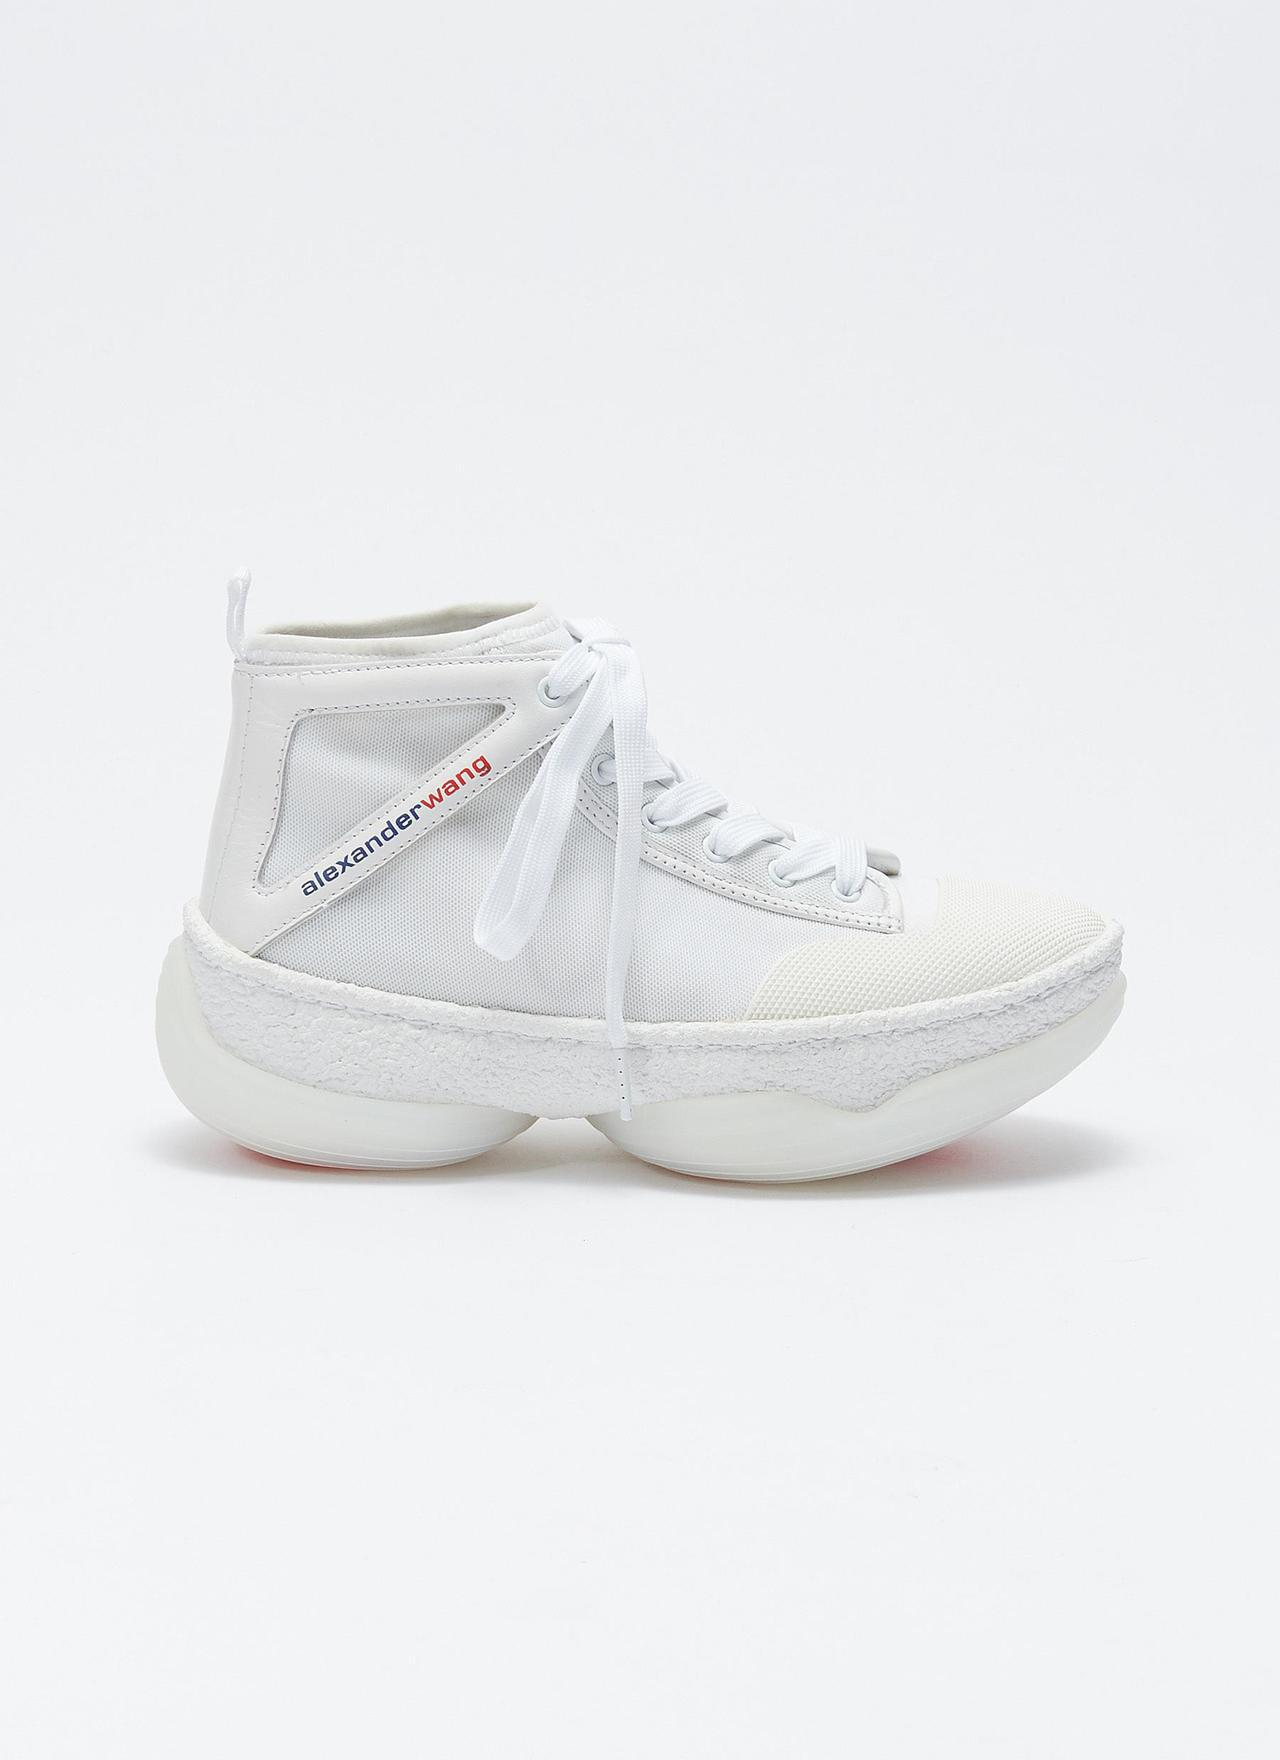 alexanderwang A1 Sneaker,售價20,800元。圖/ale...